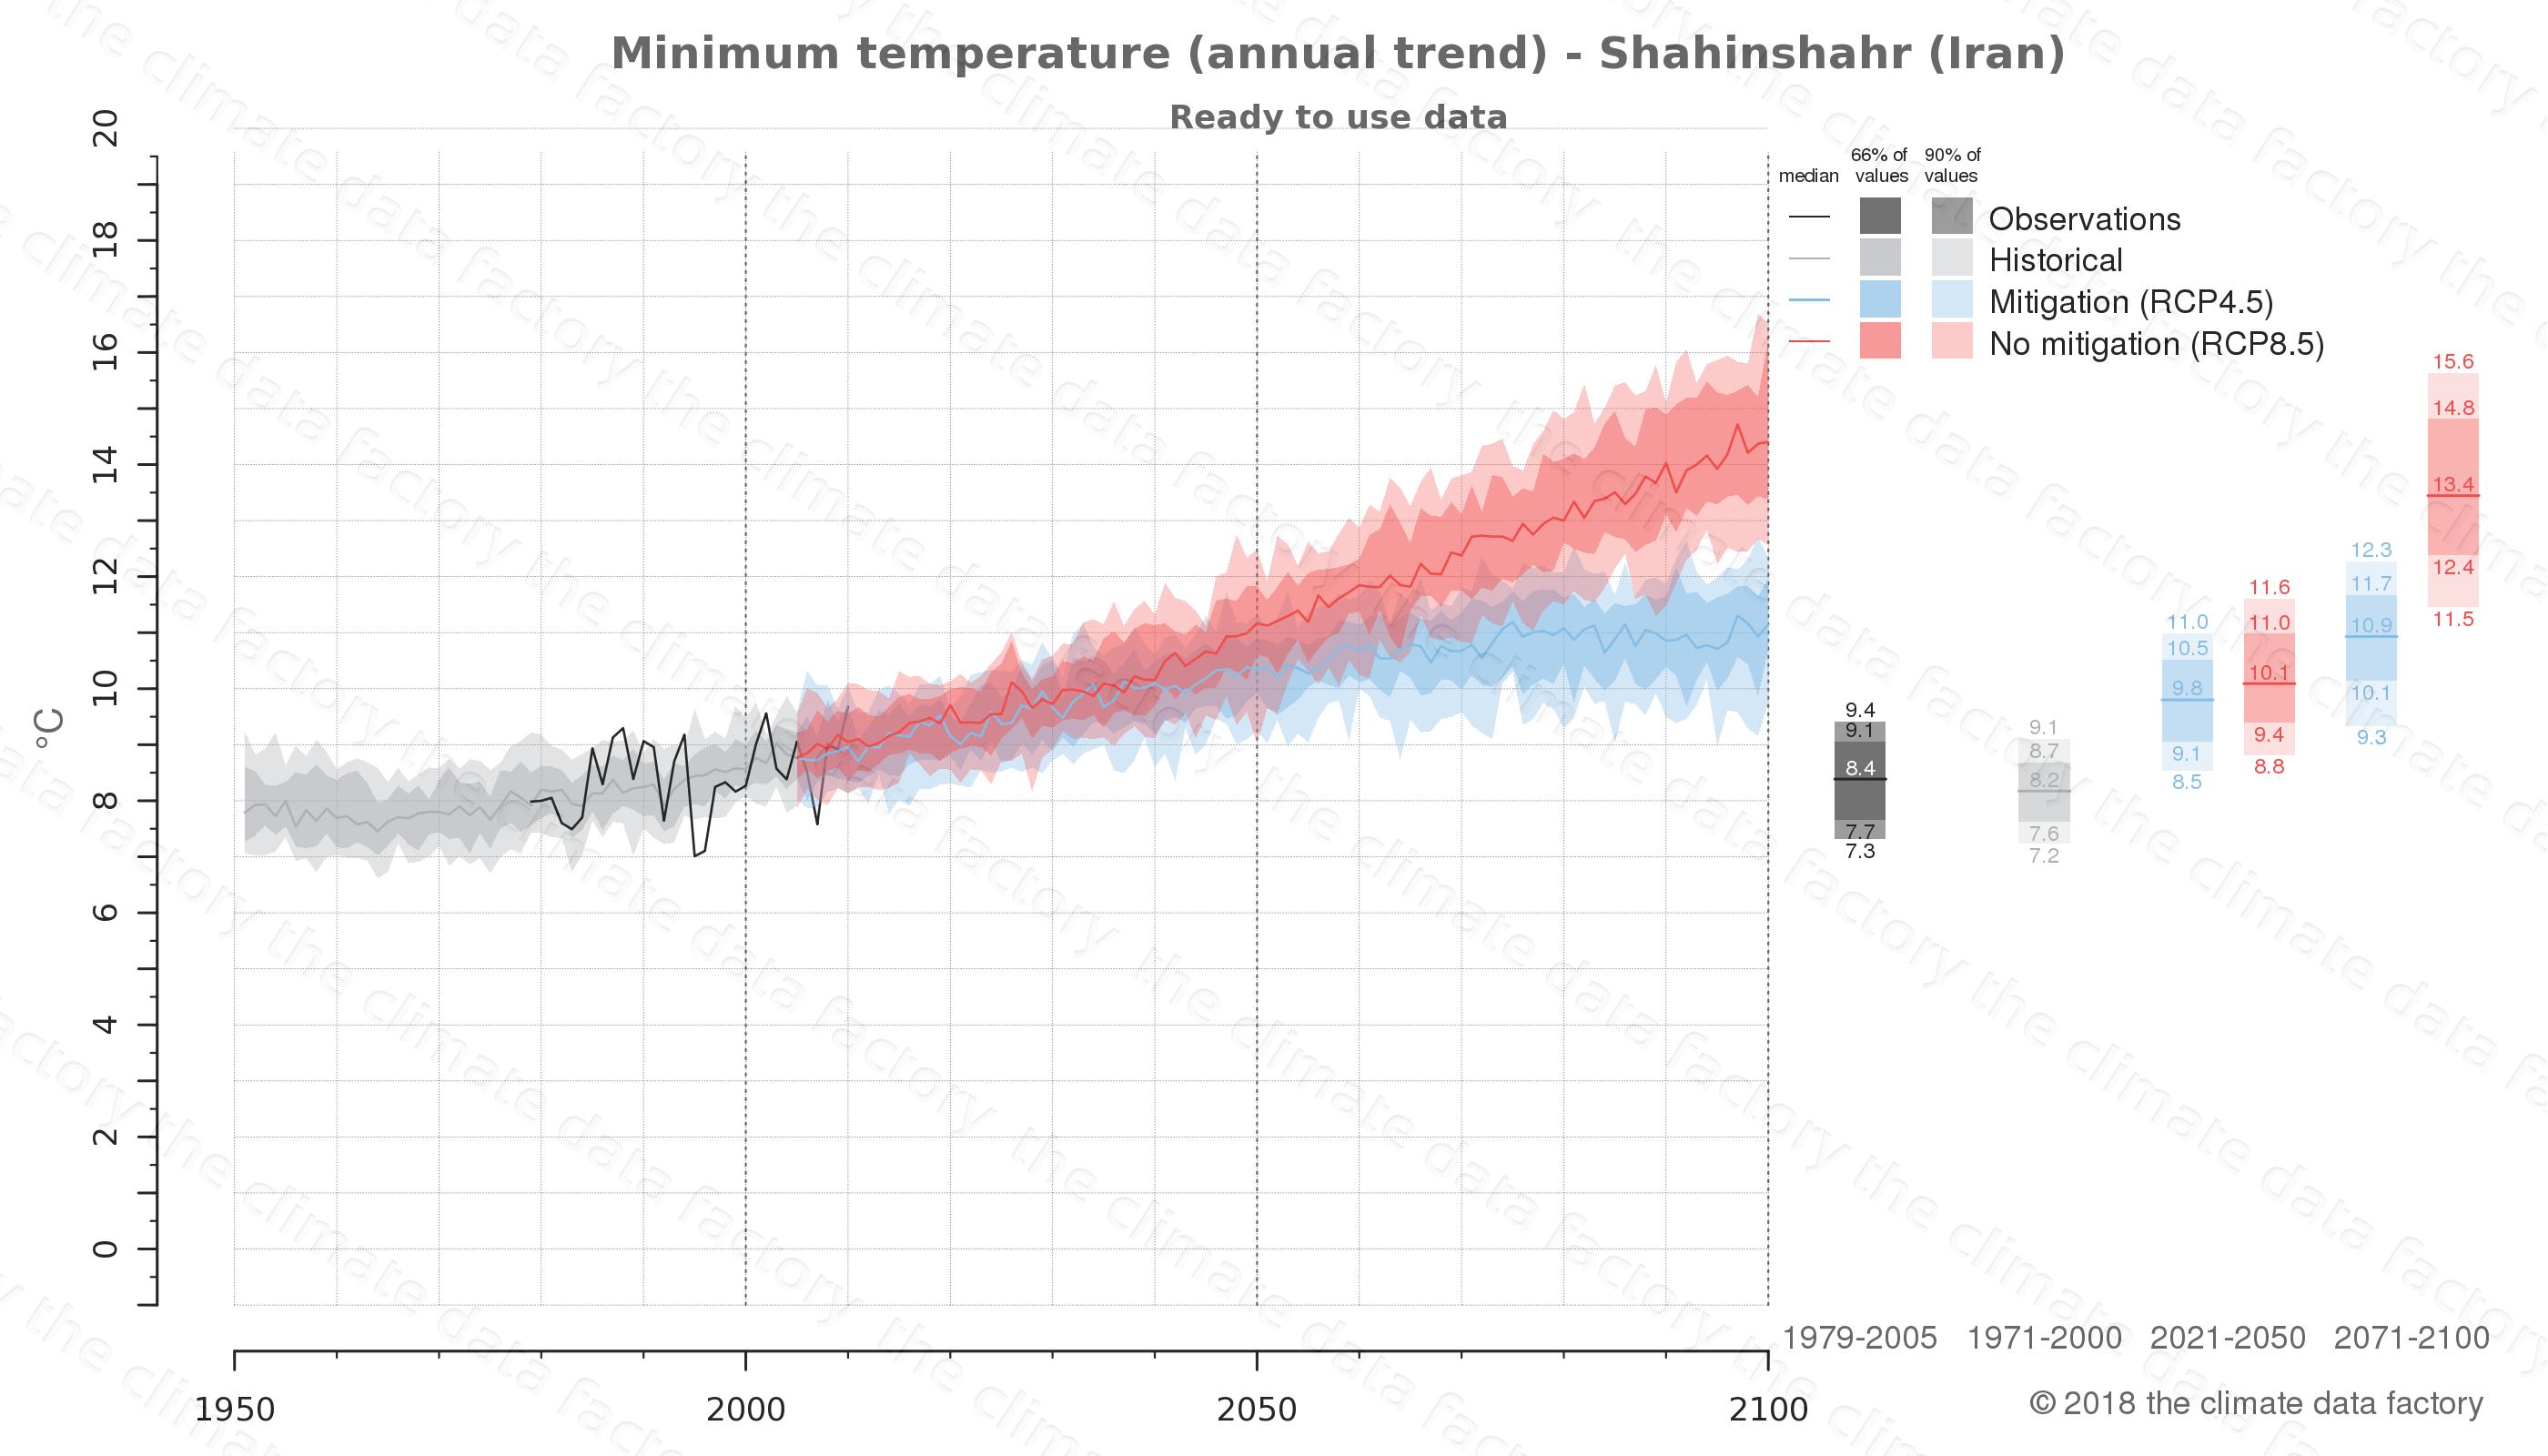 climate change data policy adaptation climate graph city data minimum-temperature shahinshahr iran